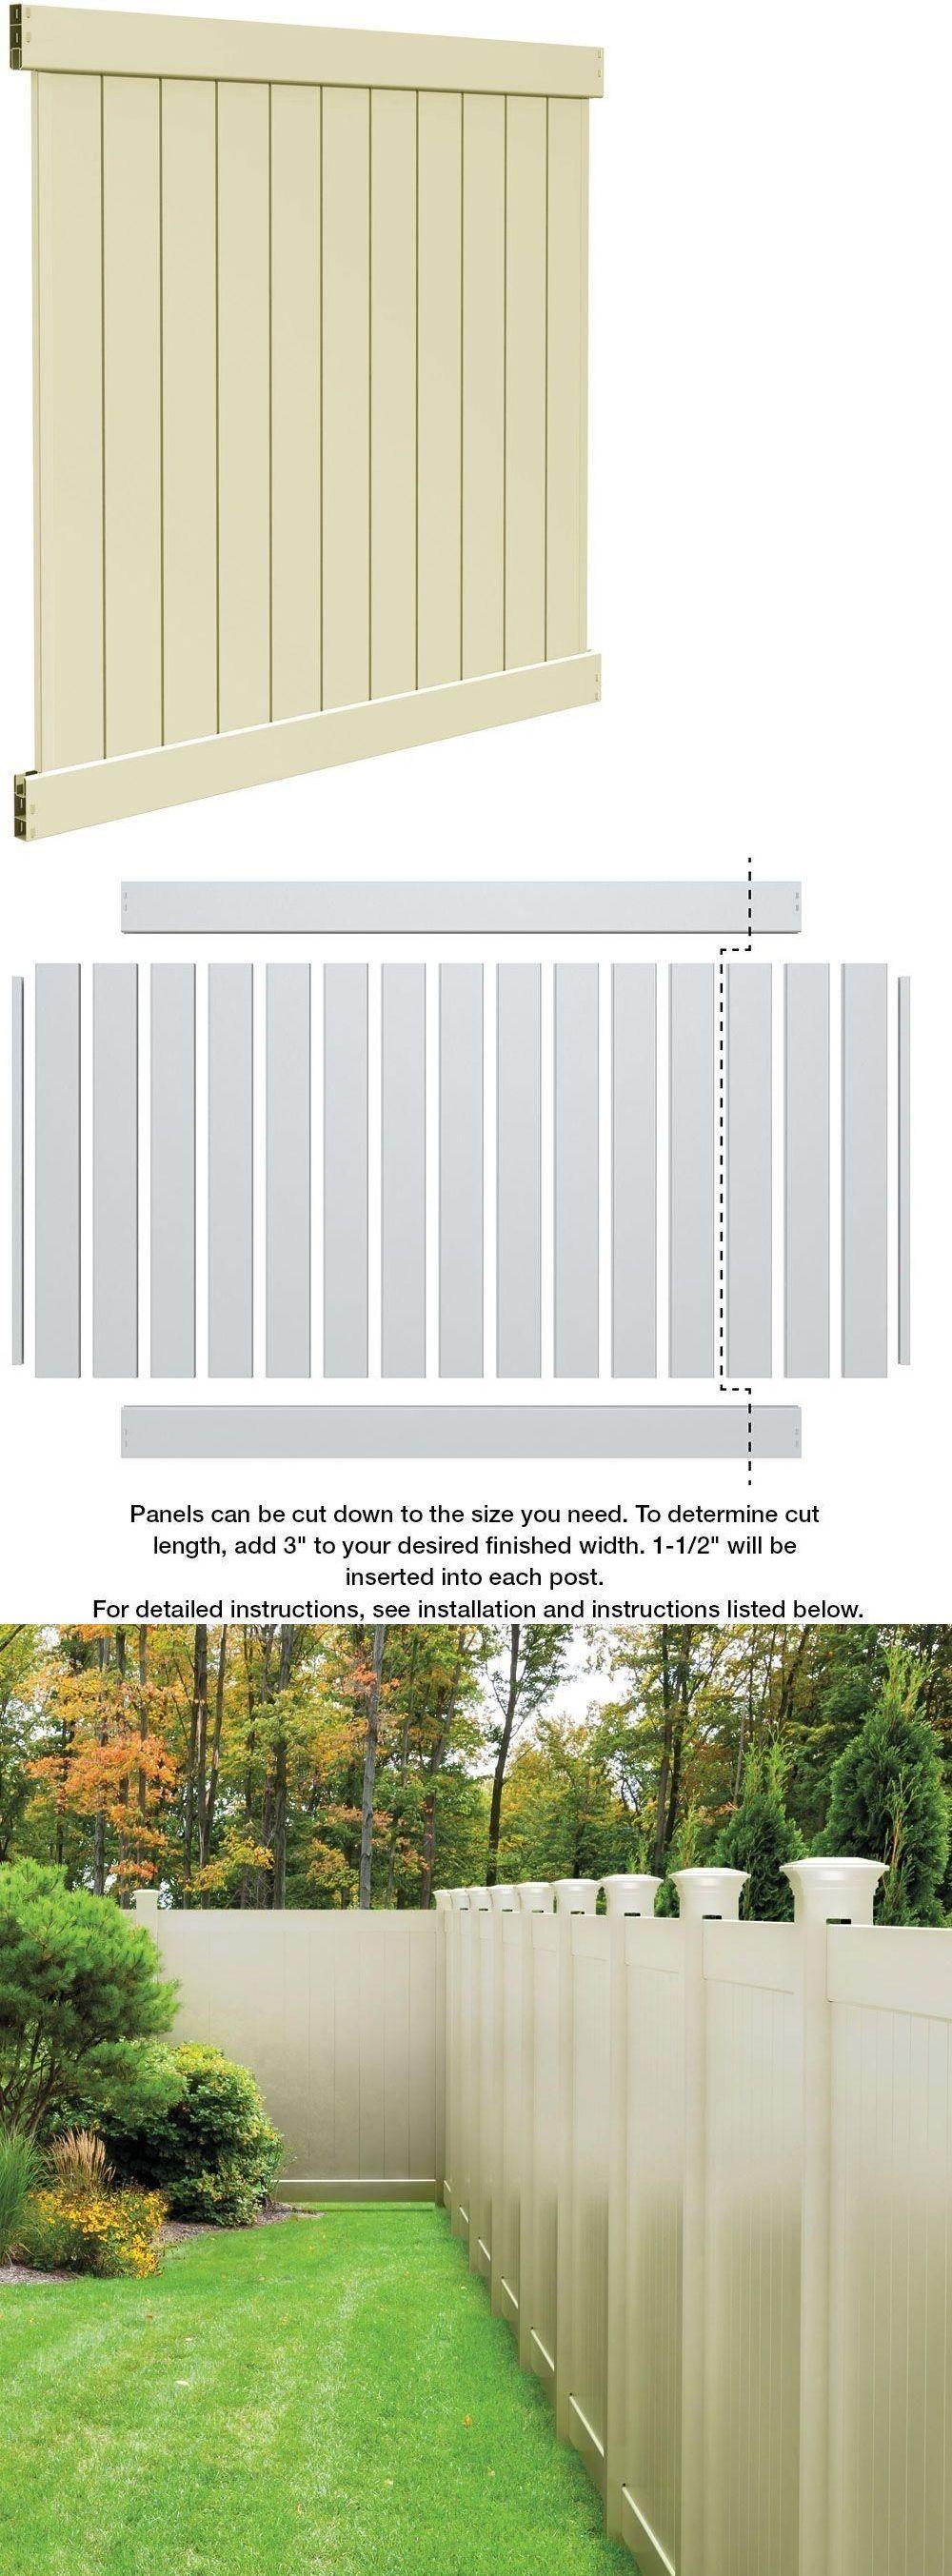 fence panels 139946 privacy vinyl fence panel kit 6 x 6 ft